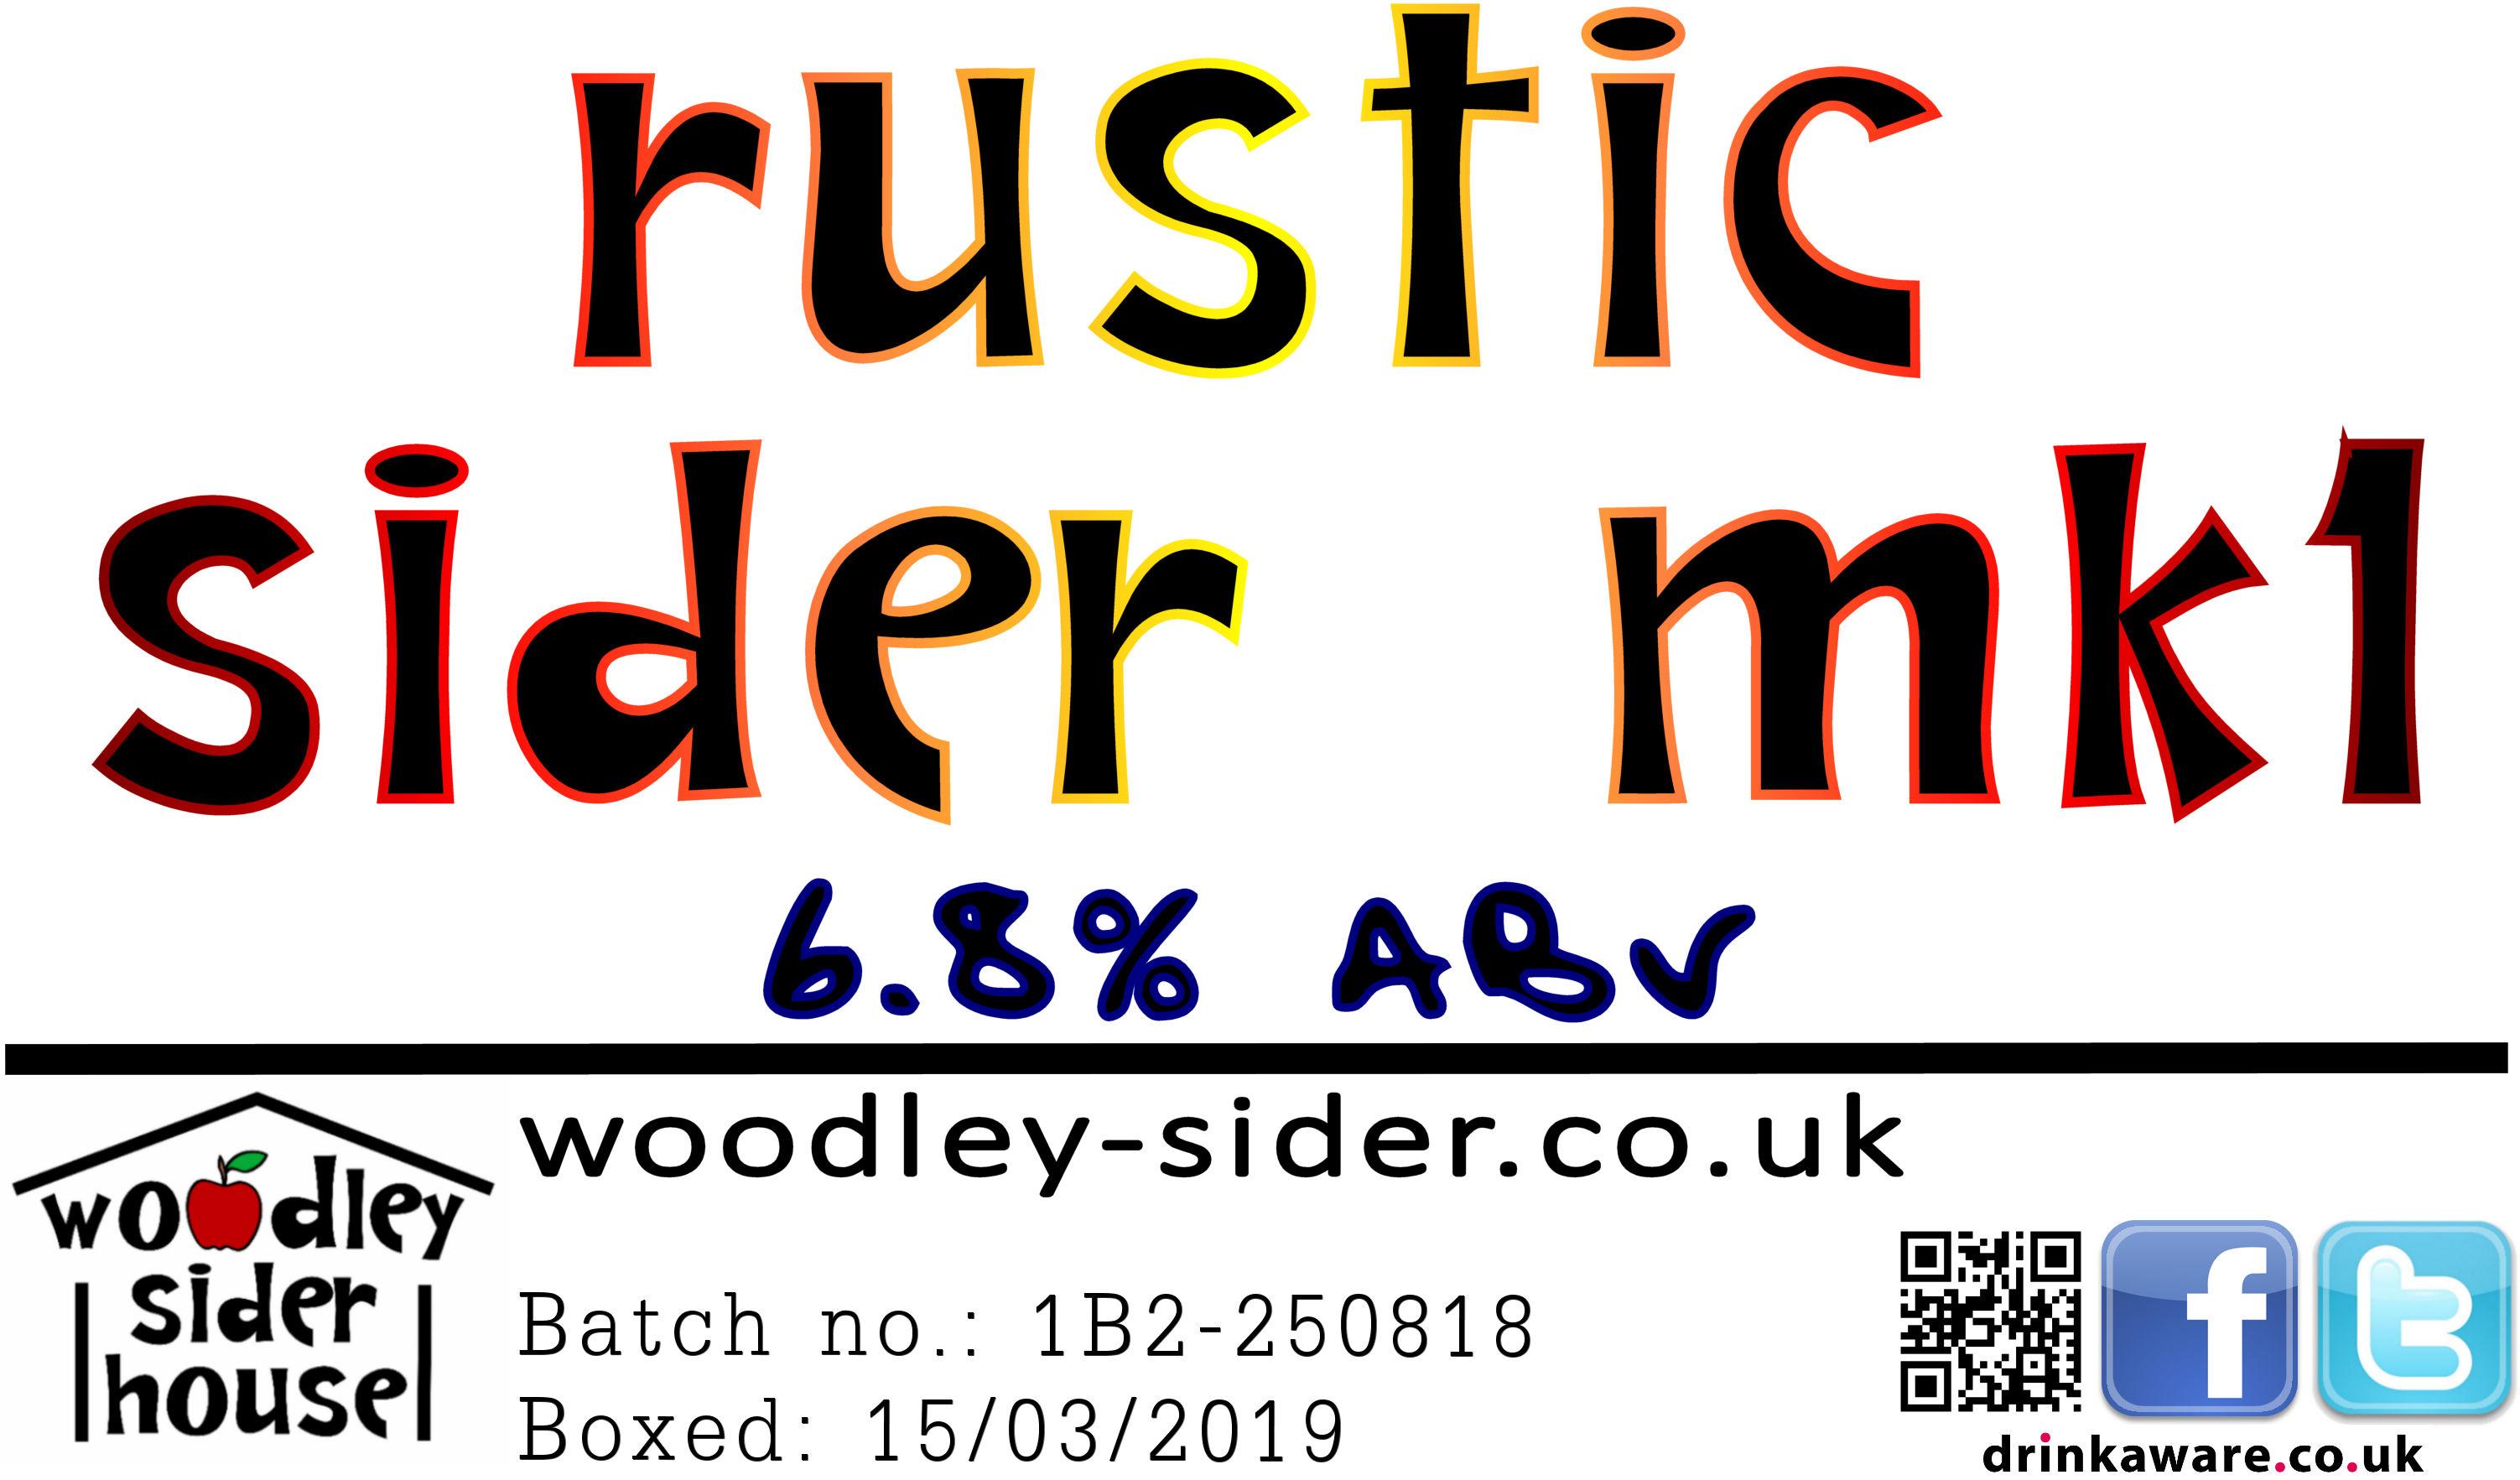 Rustic Sider Mk1_Box.jpg